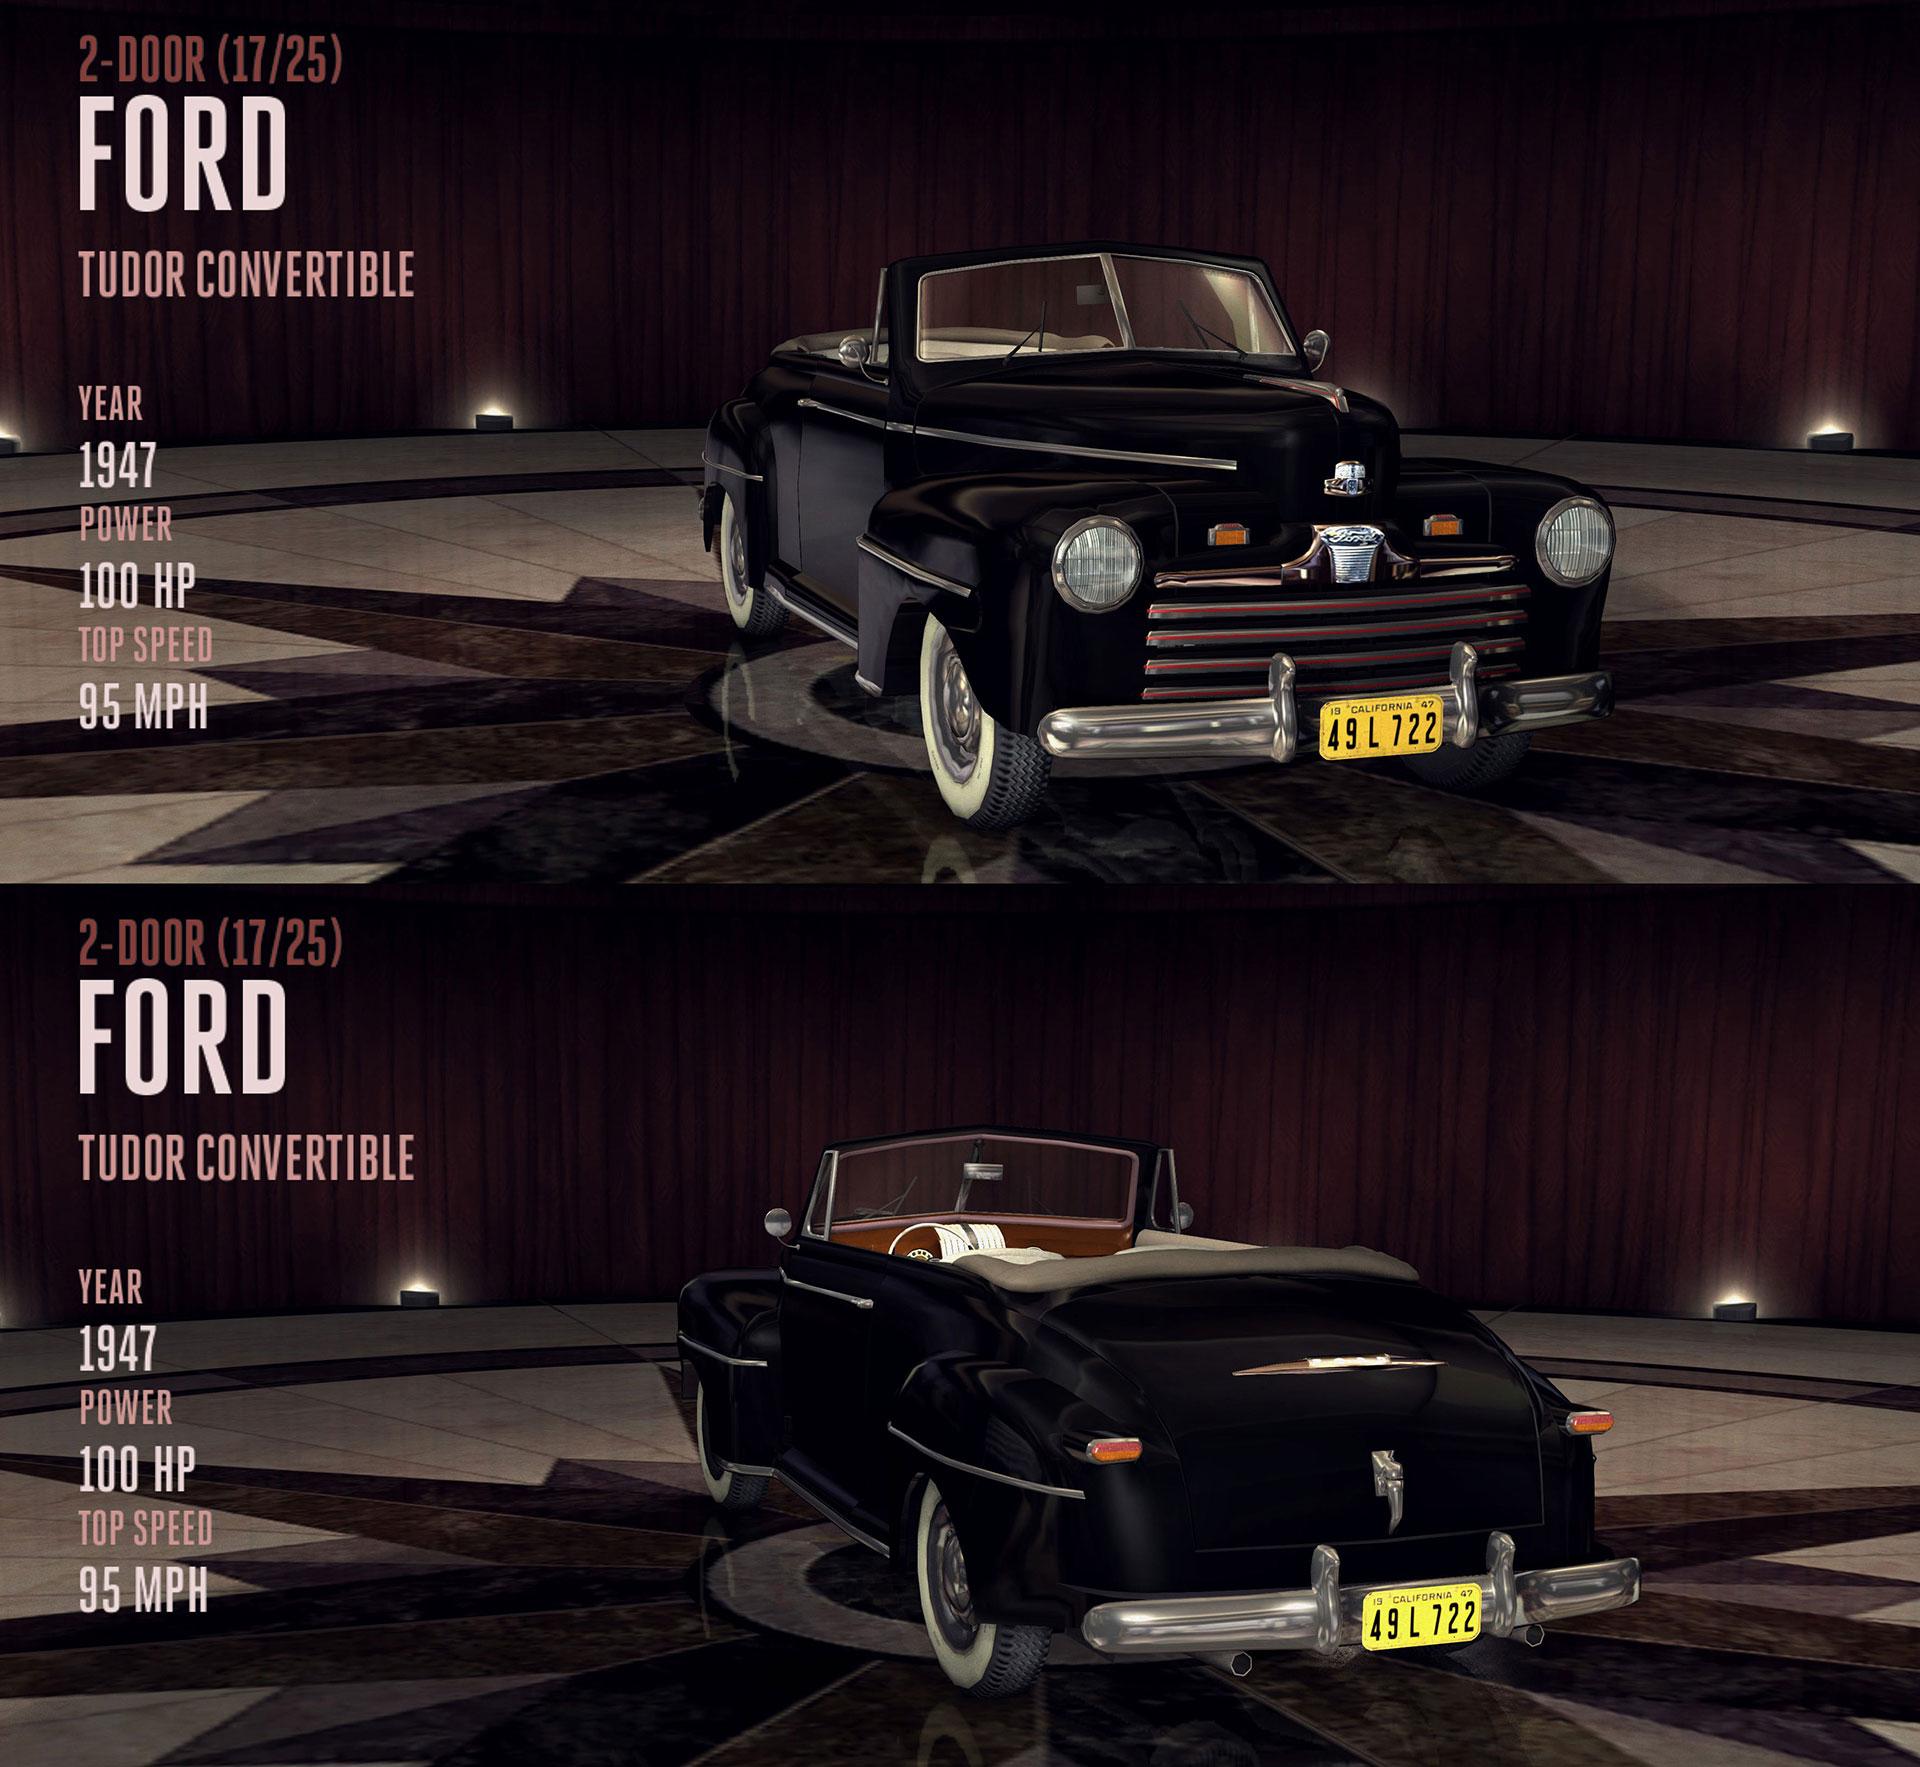 Archivo:1947-ford-tudor-convertible.jpg